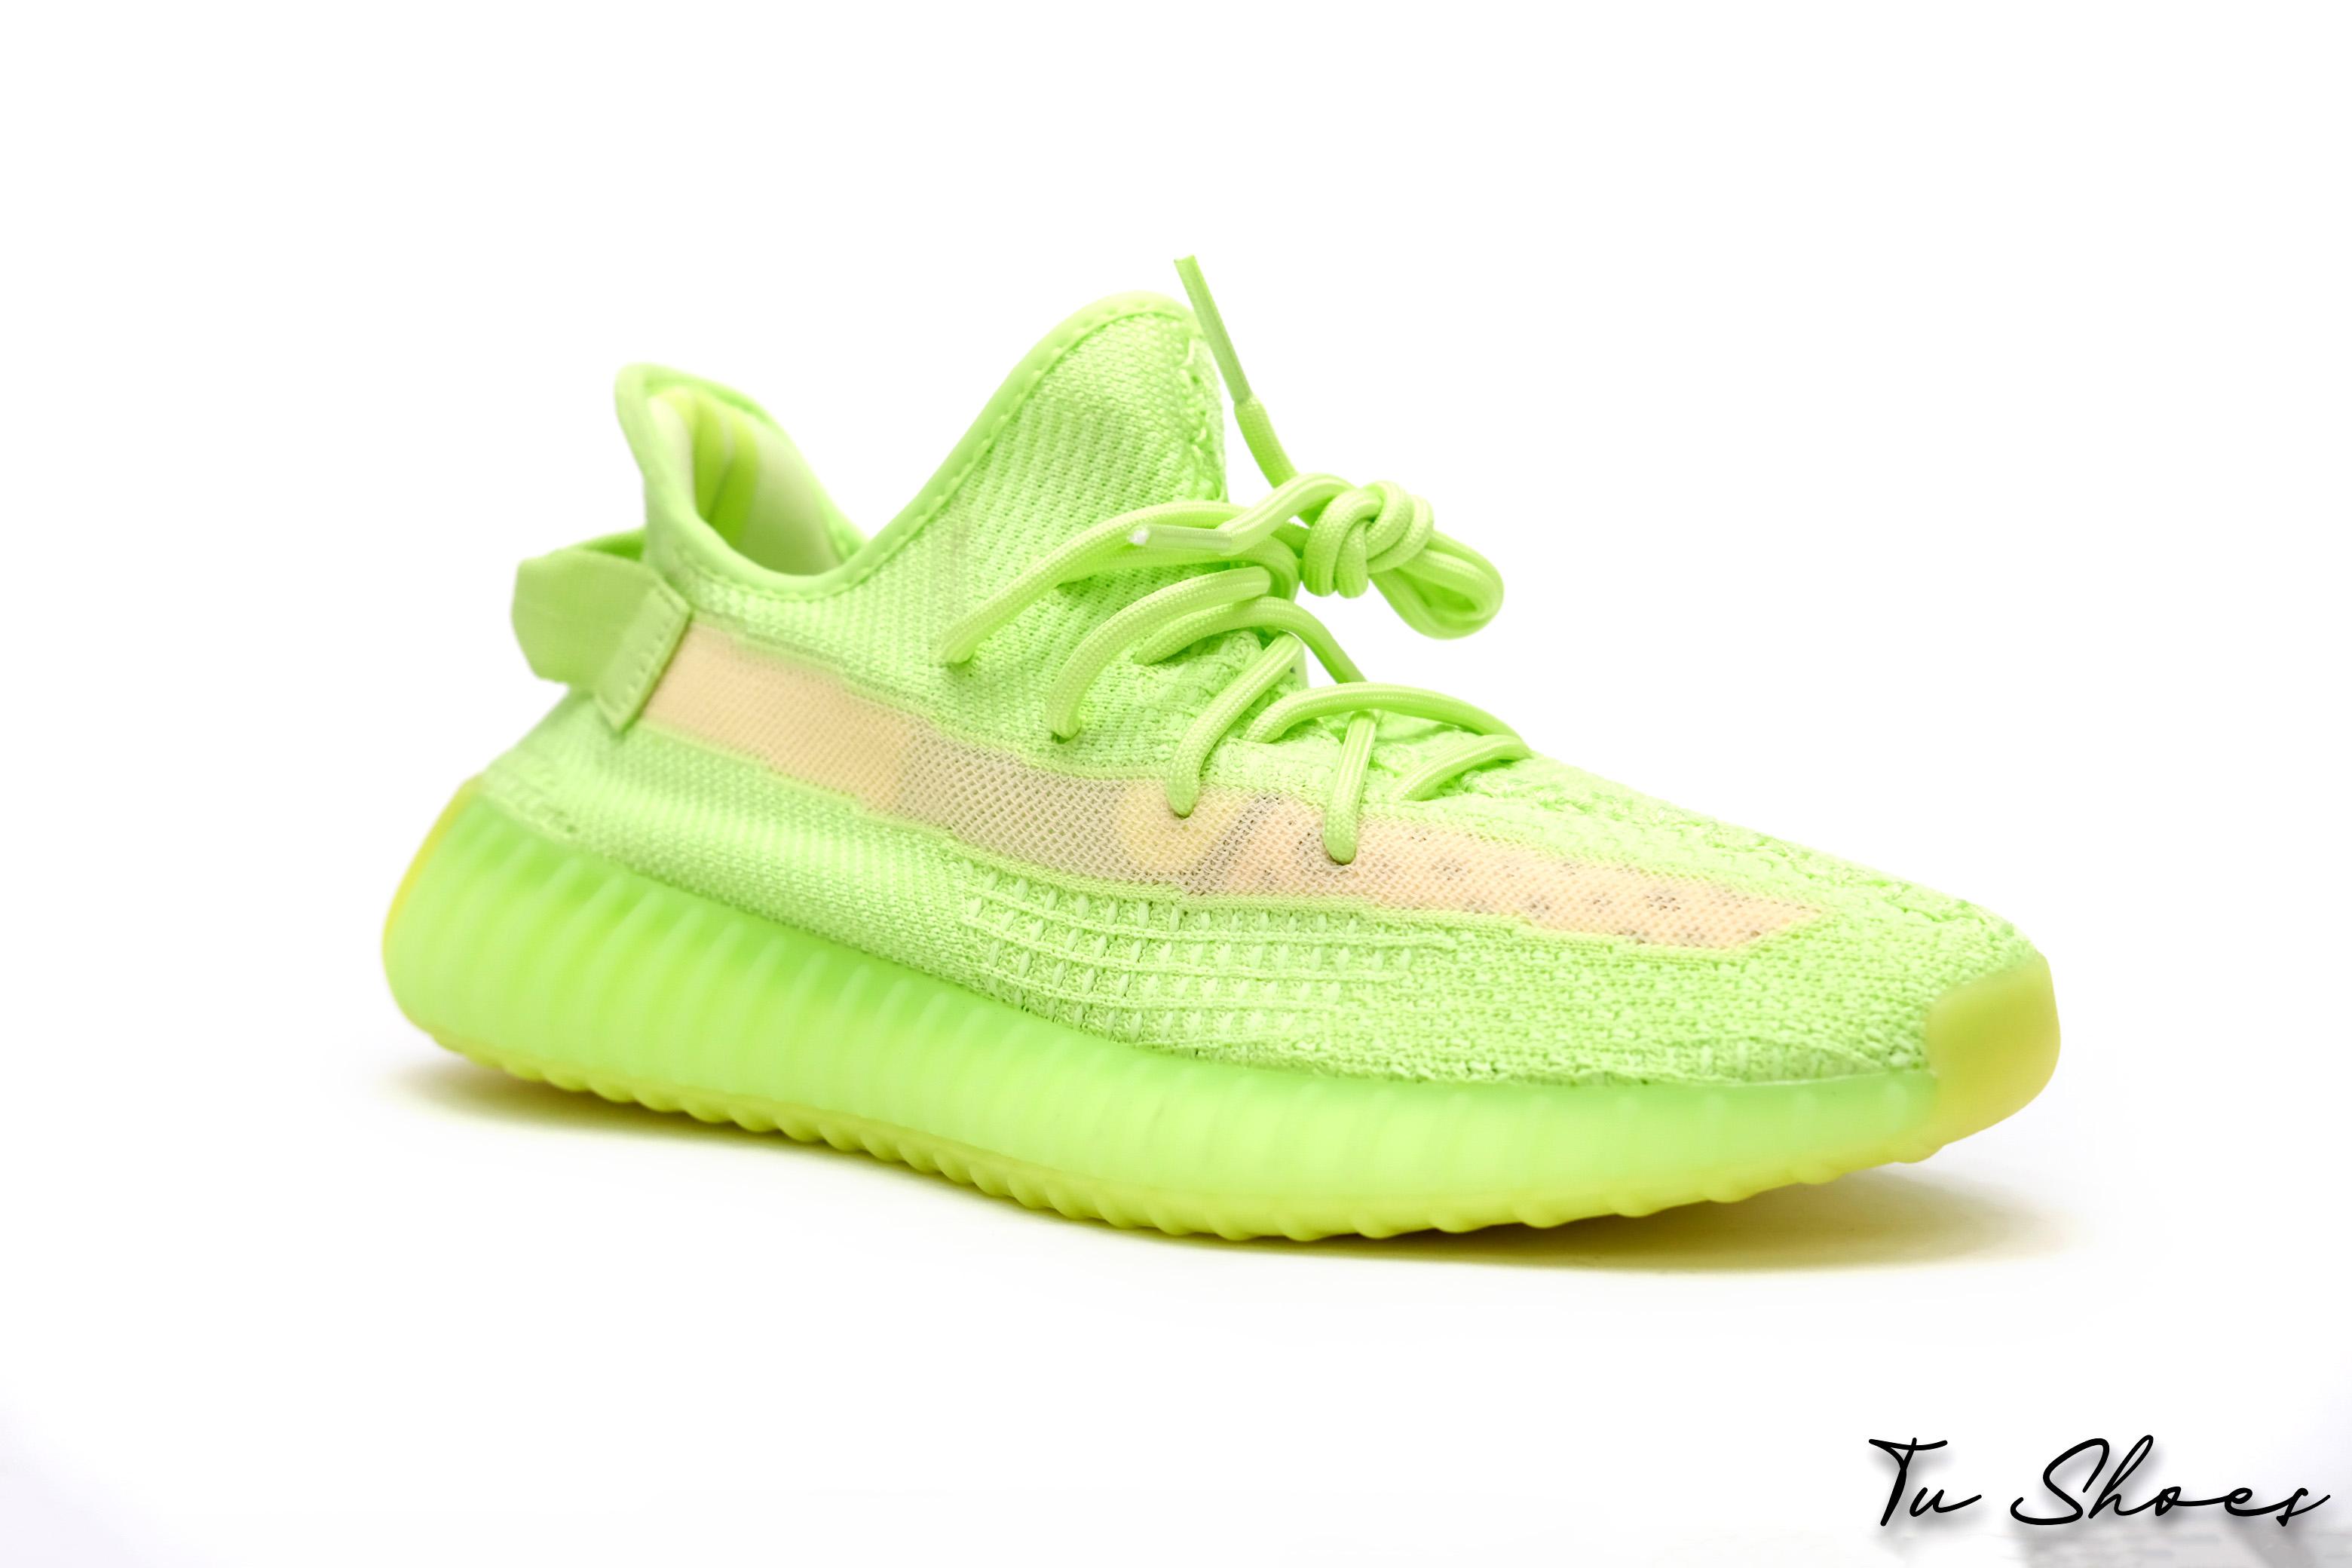 yeezy-boost-350-v2-gid-glow-1-1